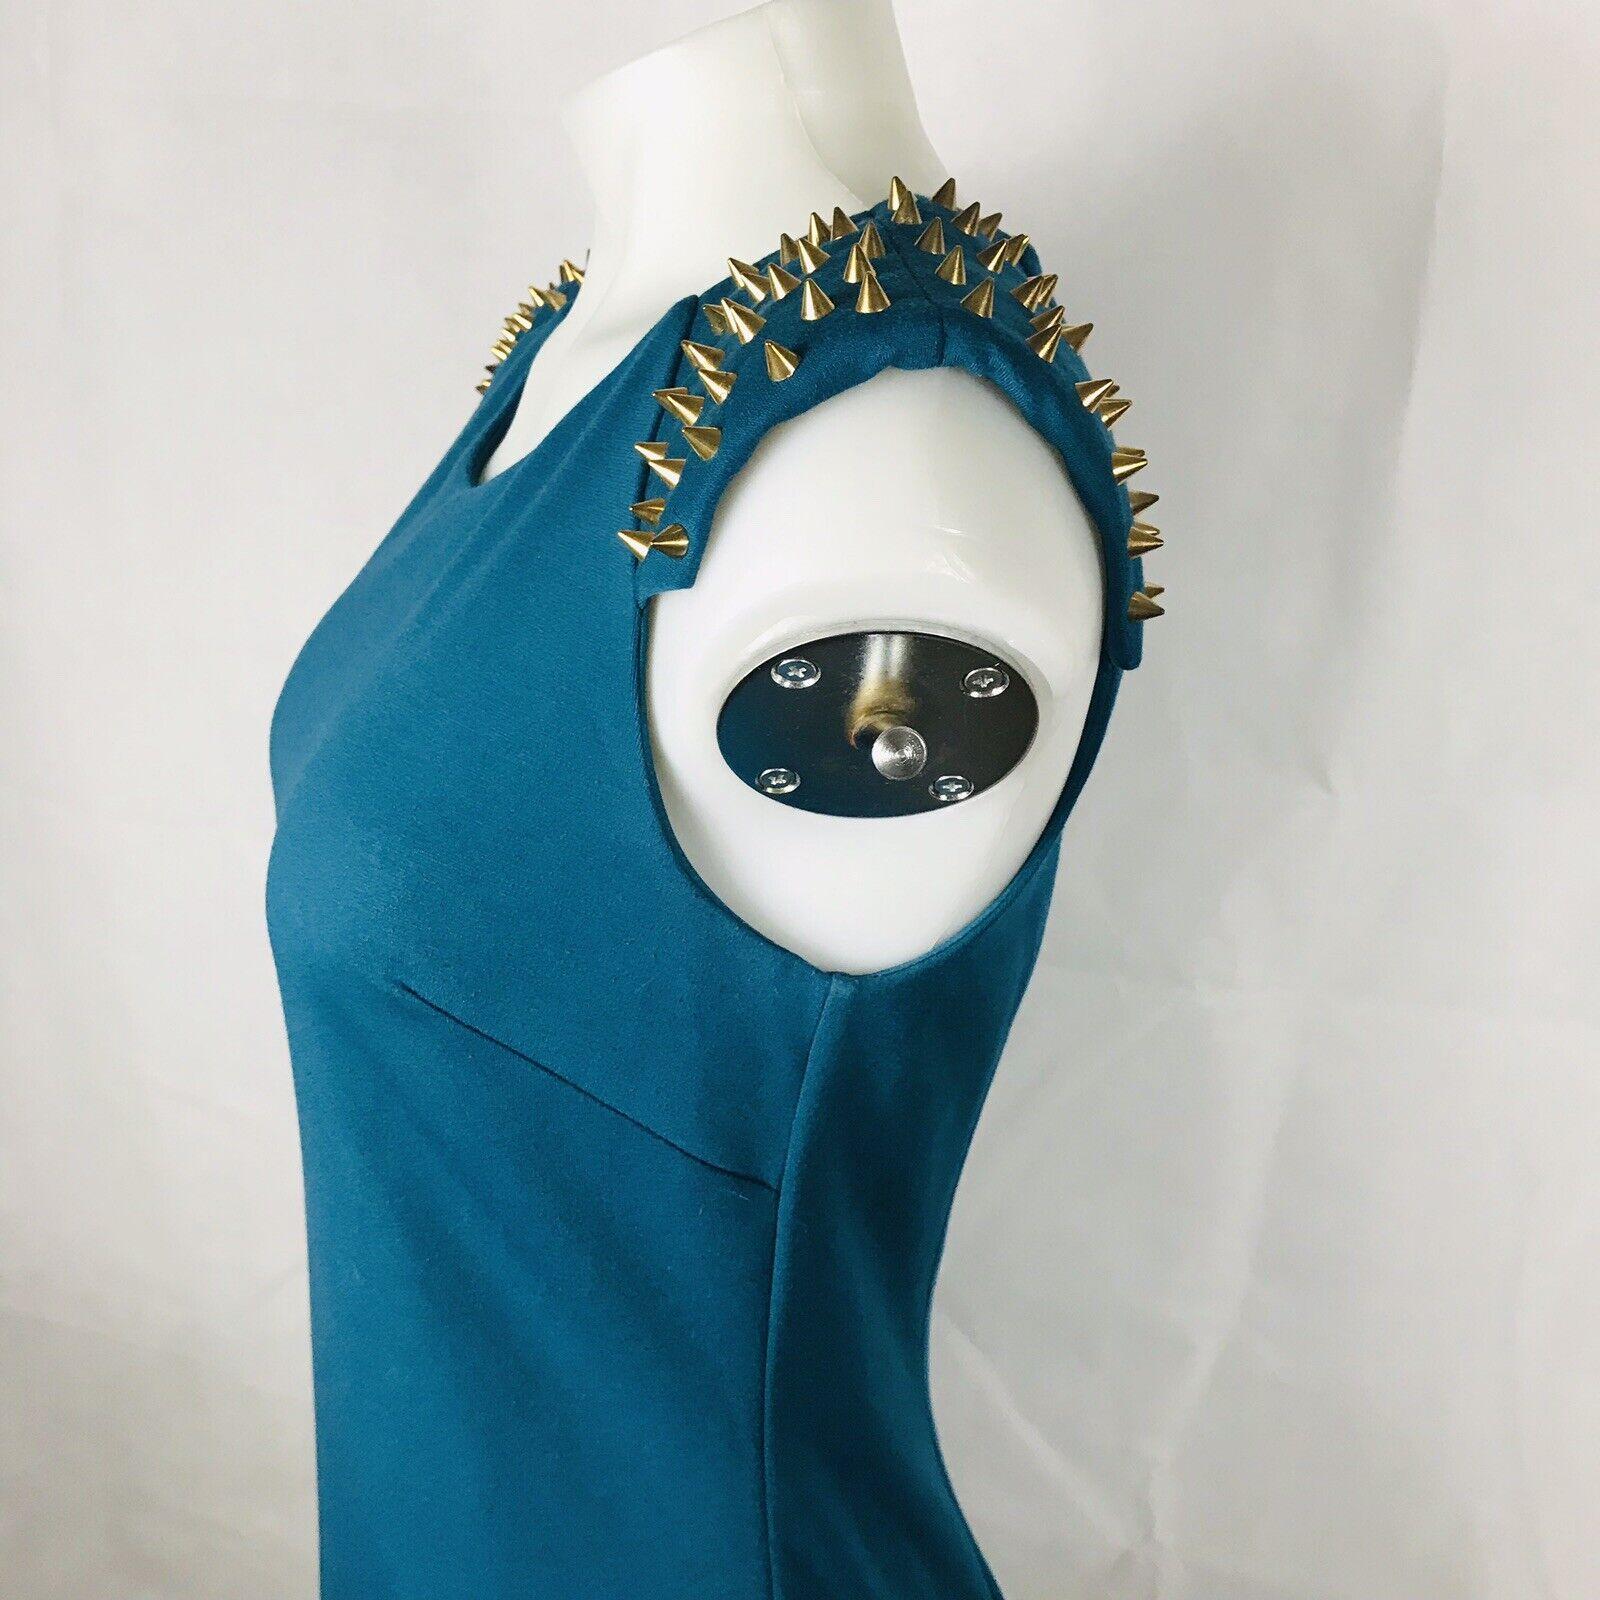 Betsey Johnson Woman's Dress Beads Gold Aqua Blau  Sz 6  ONE of the KIND